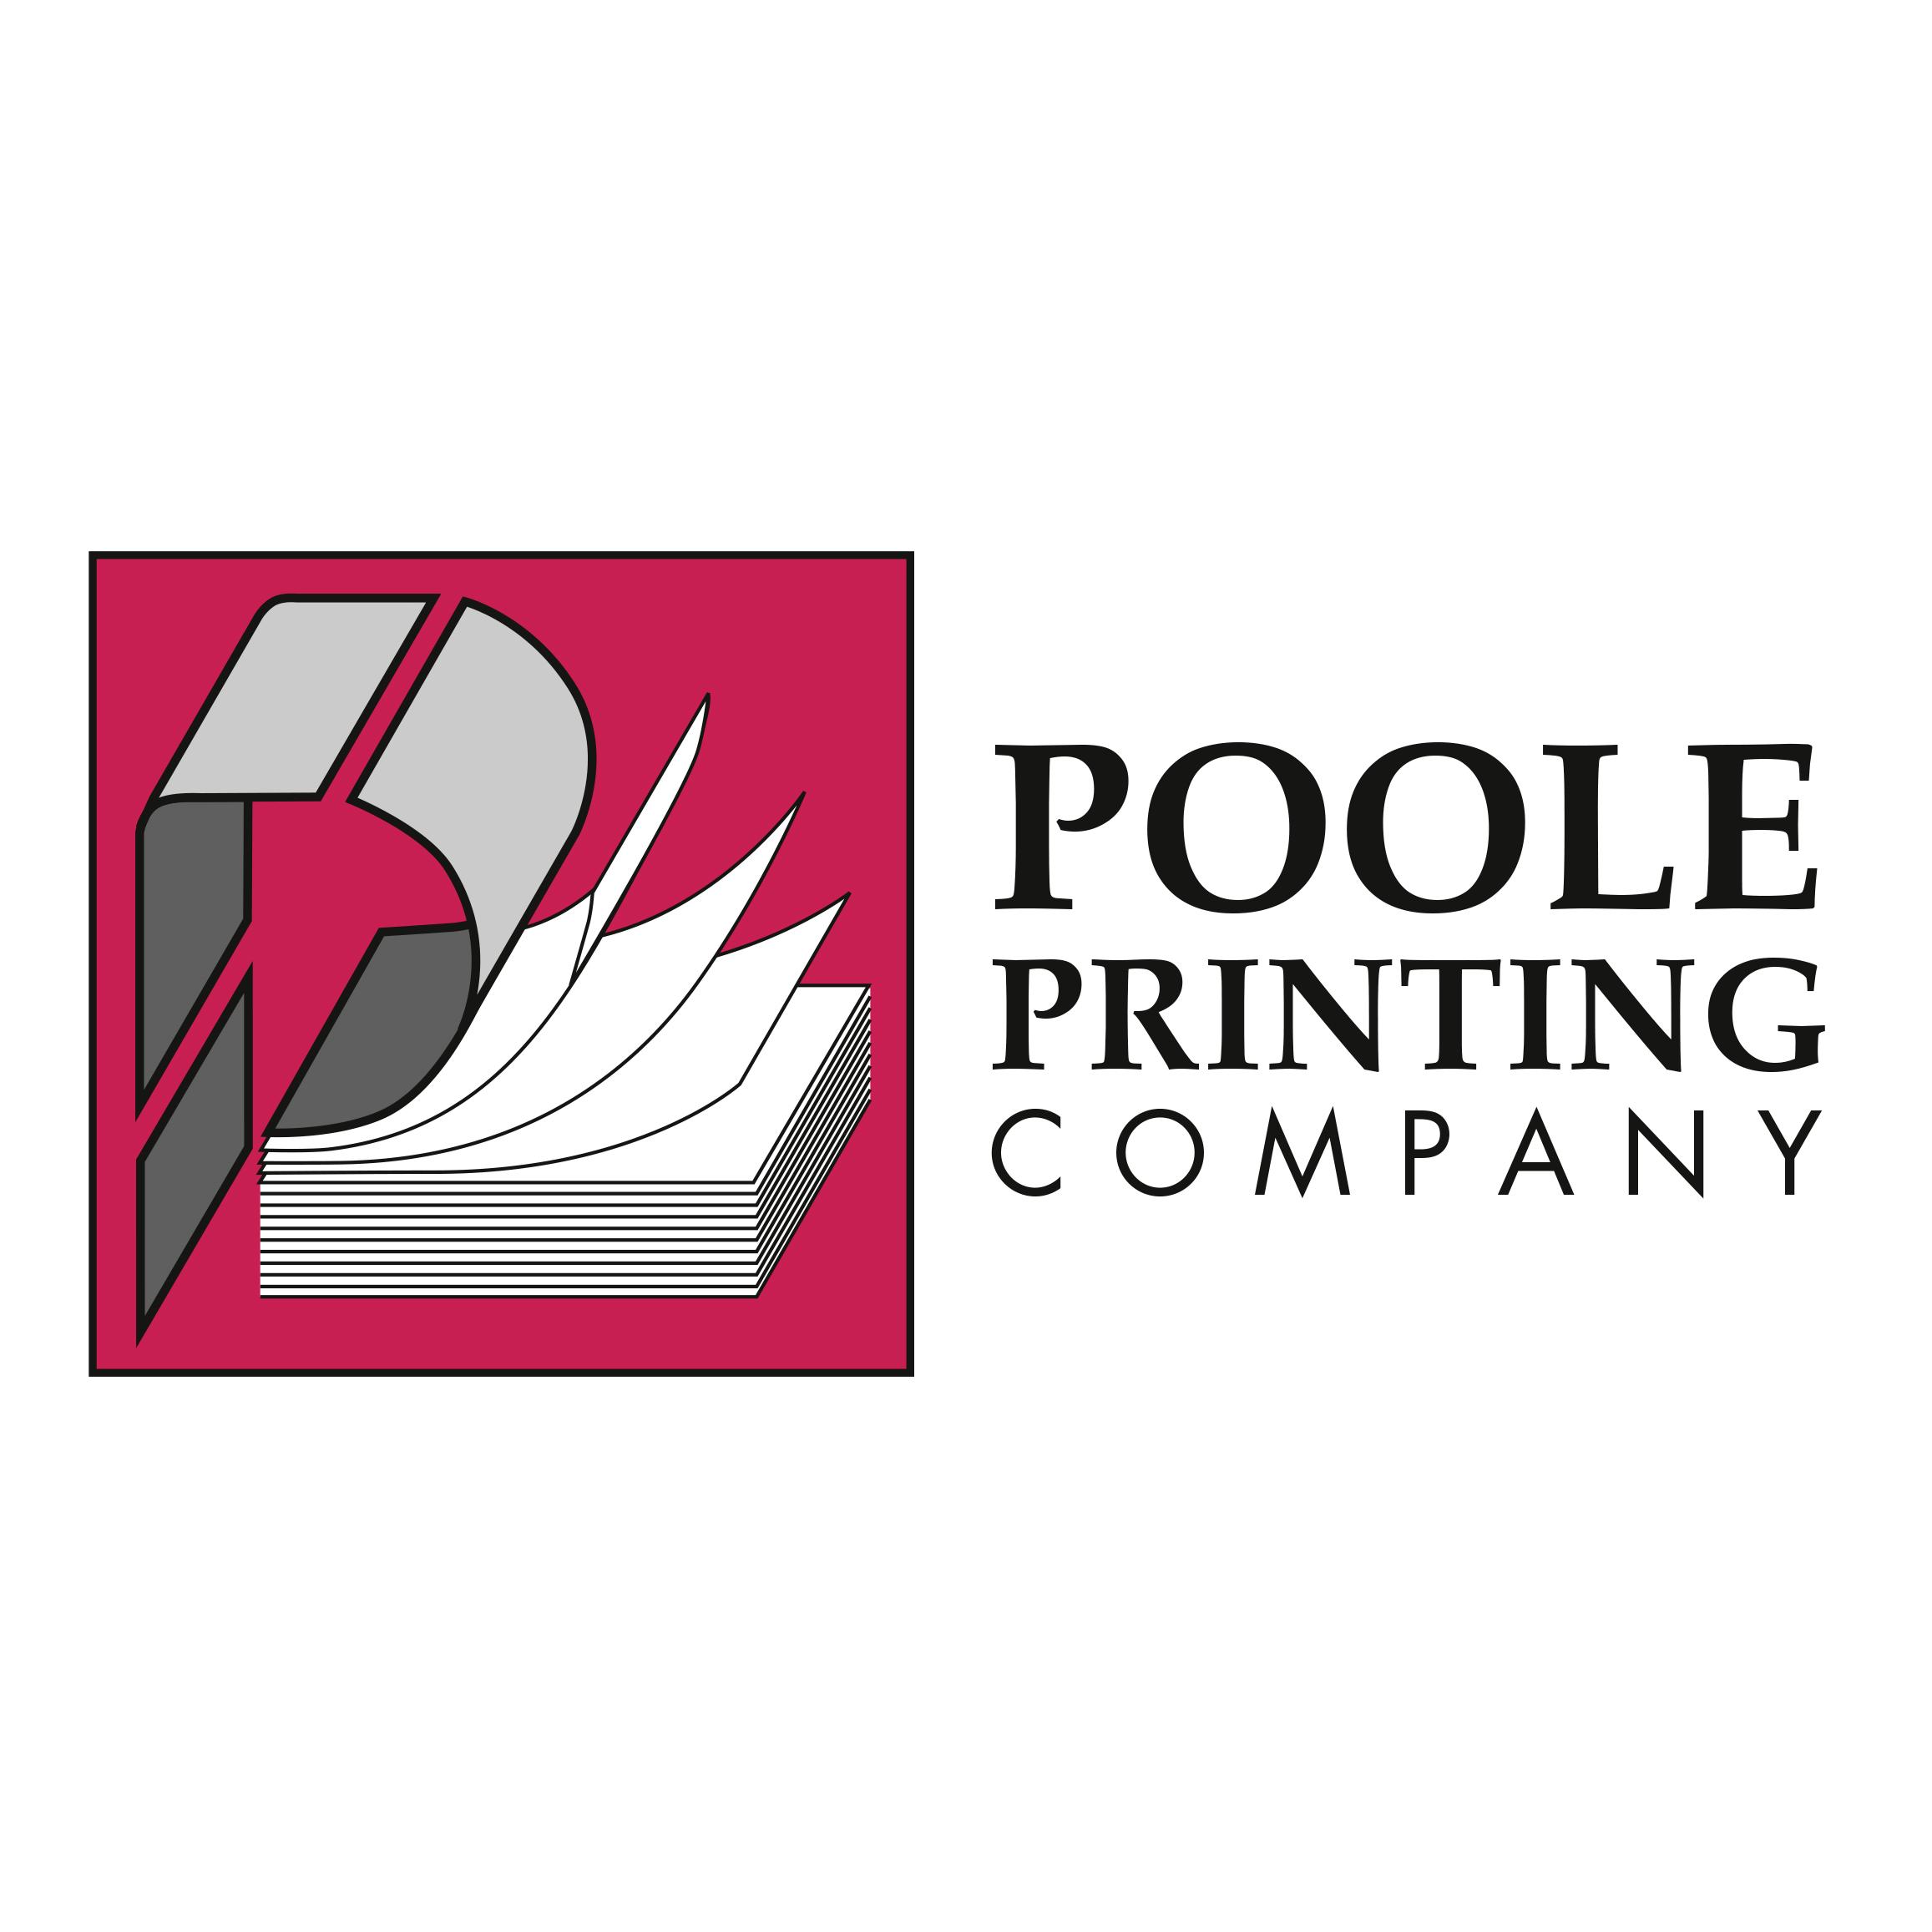 Poole Printing